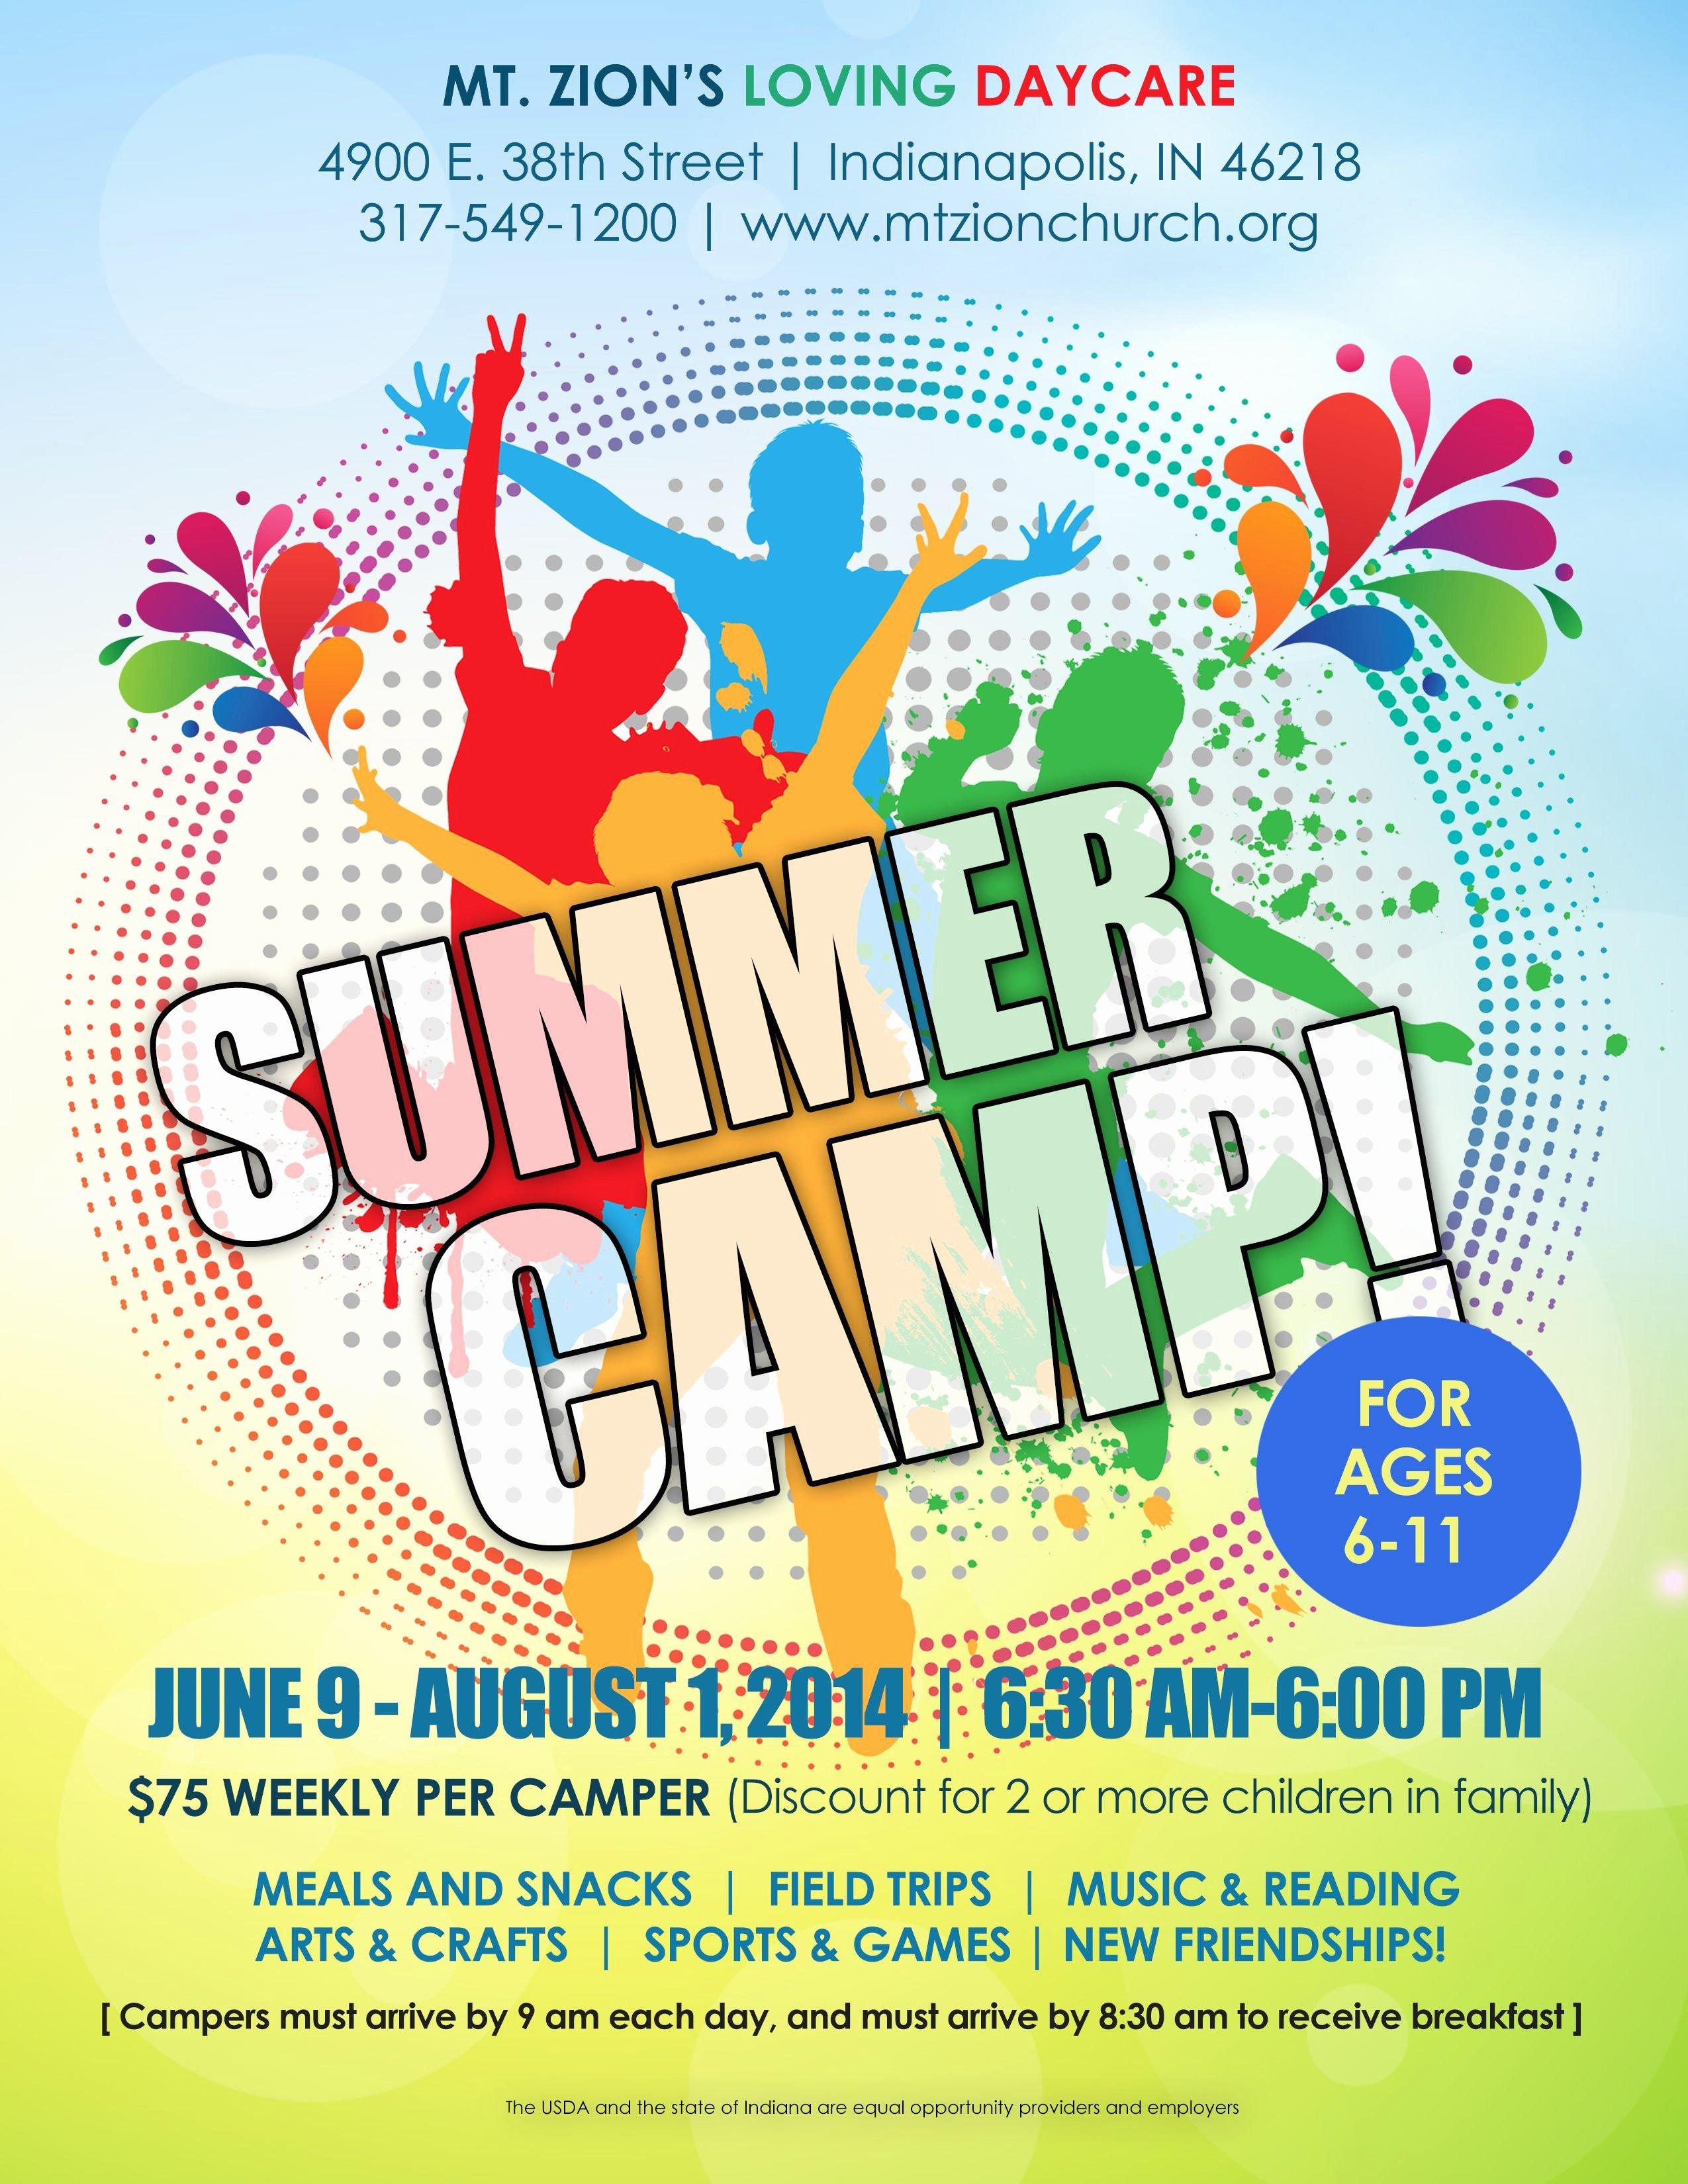 Summer Camp Flyer Templates Free Fresh Summer Camp Flyer Idea Kid Min